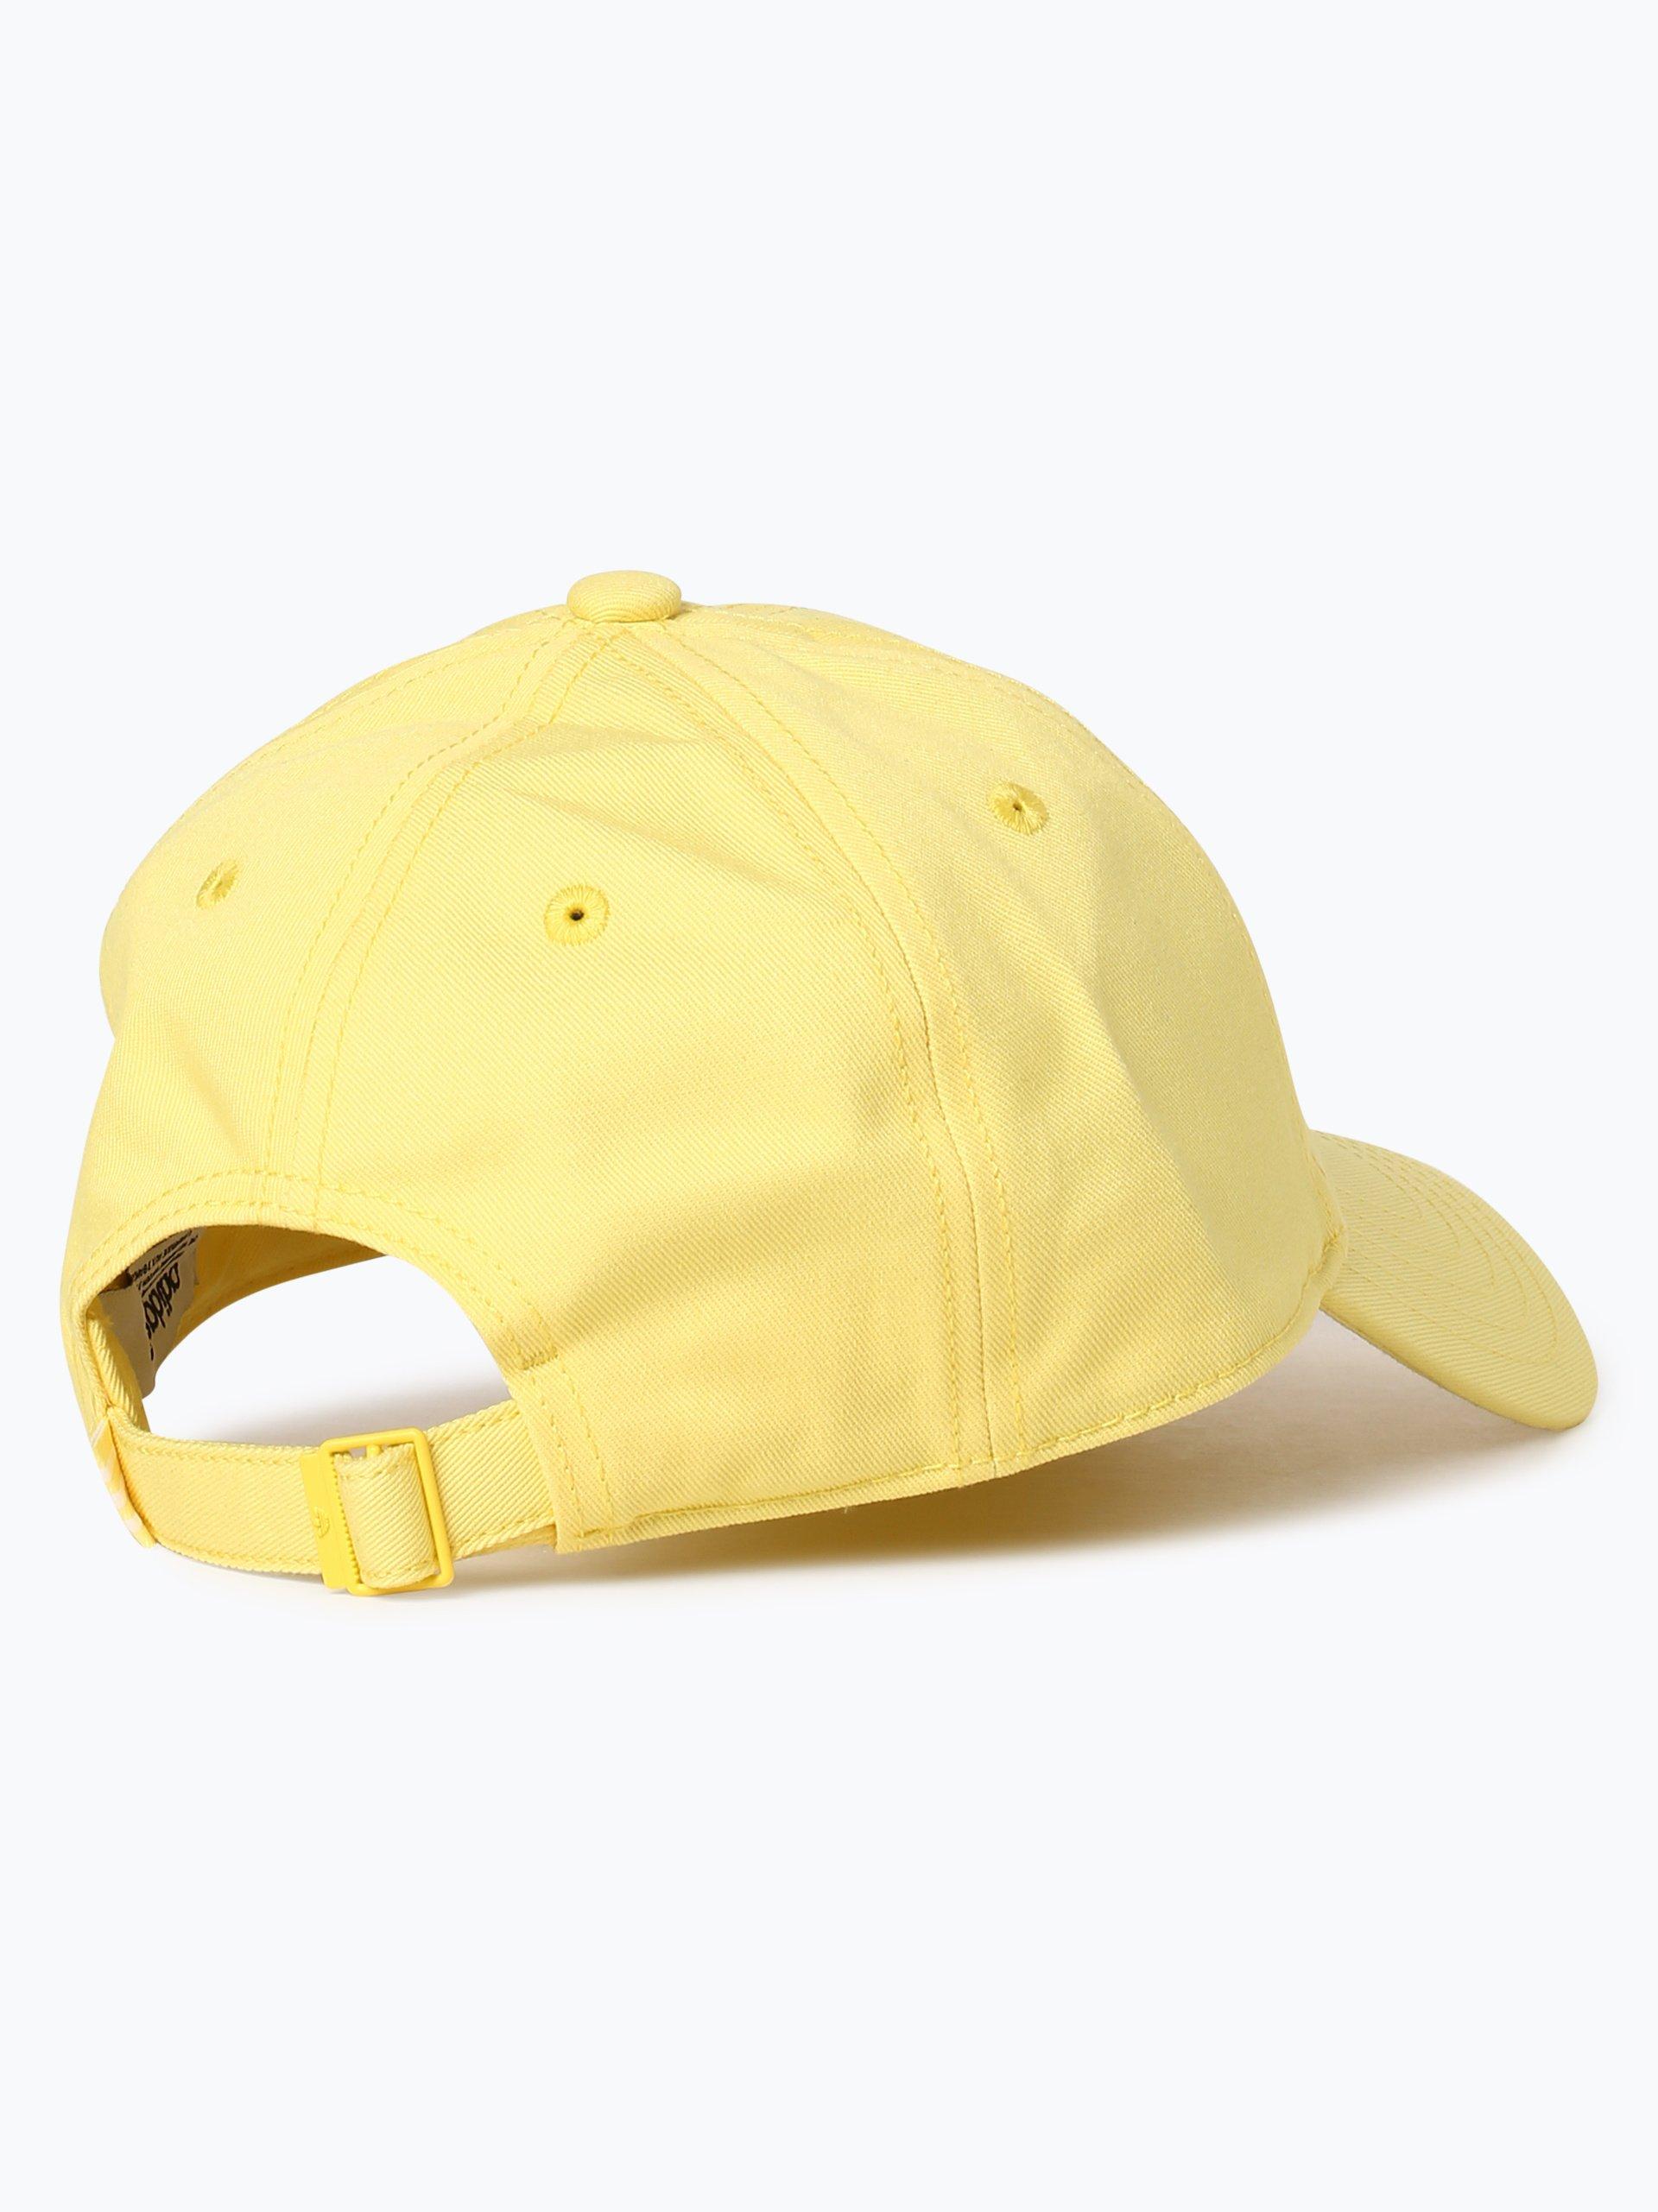 adidas originals herren cap gelb uni online kaufen peek. Black Bedroom Furniture Sets. Home Design Ideas